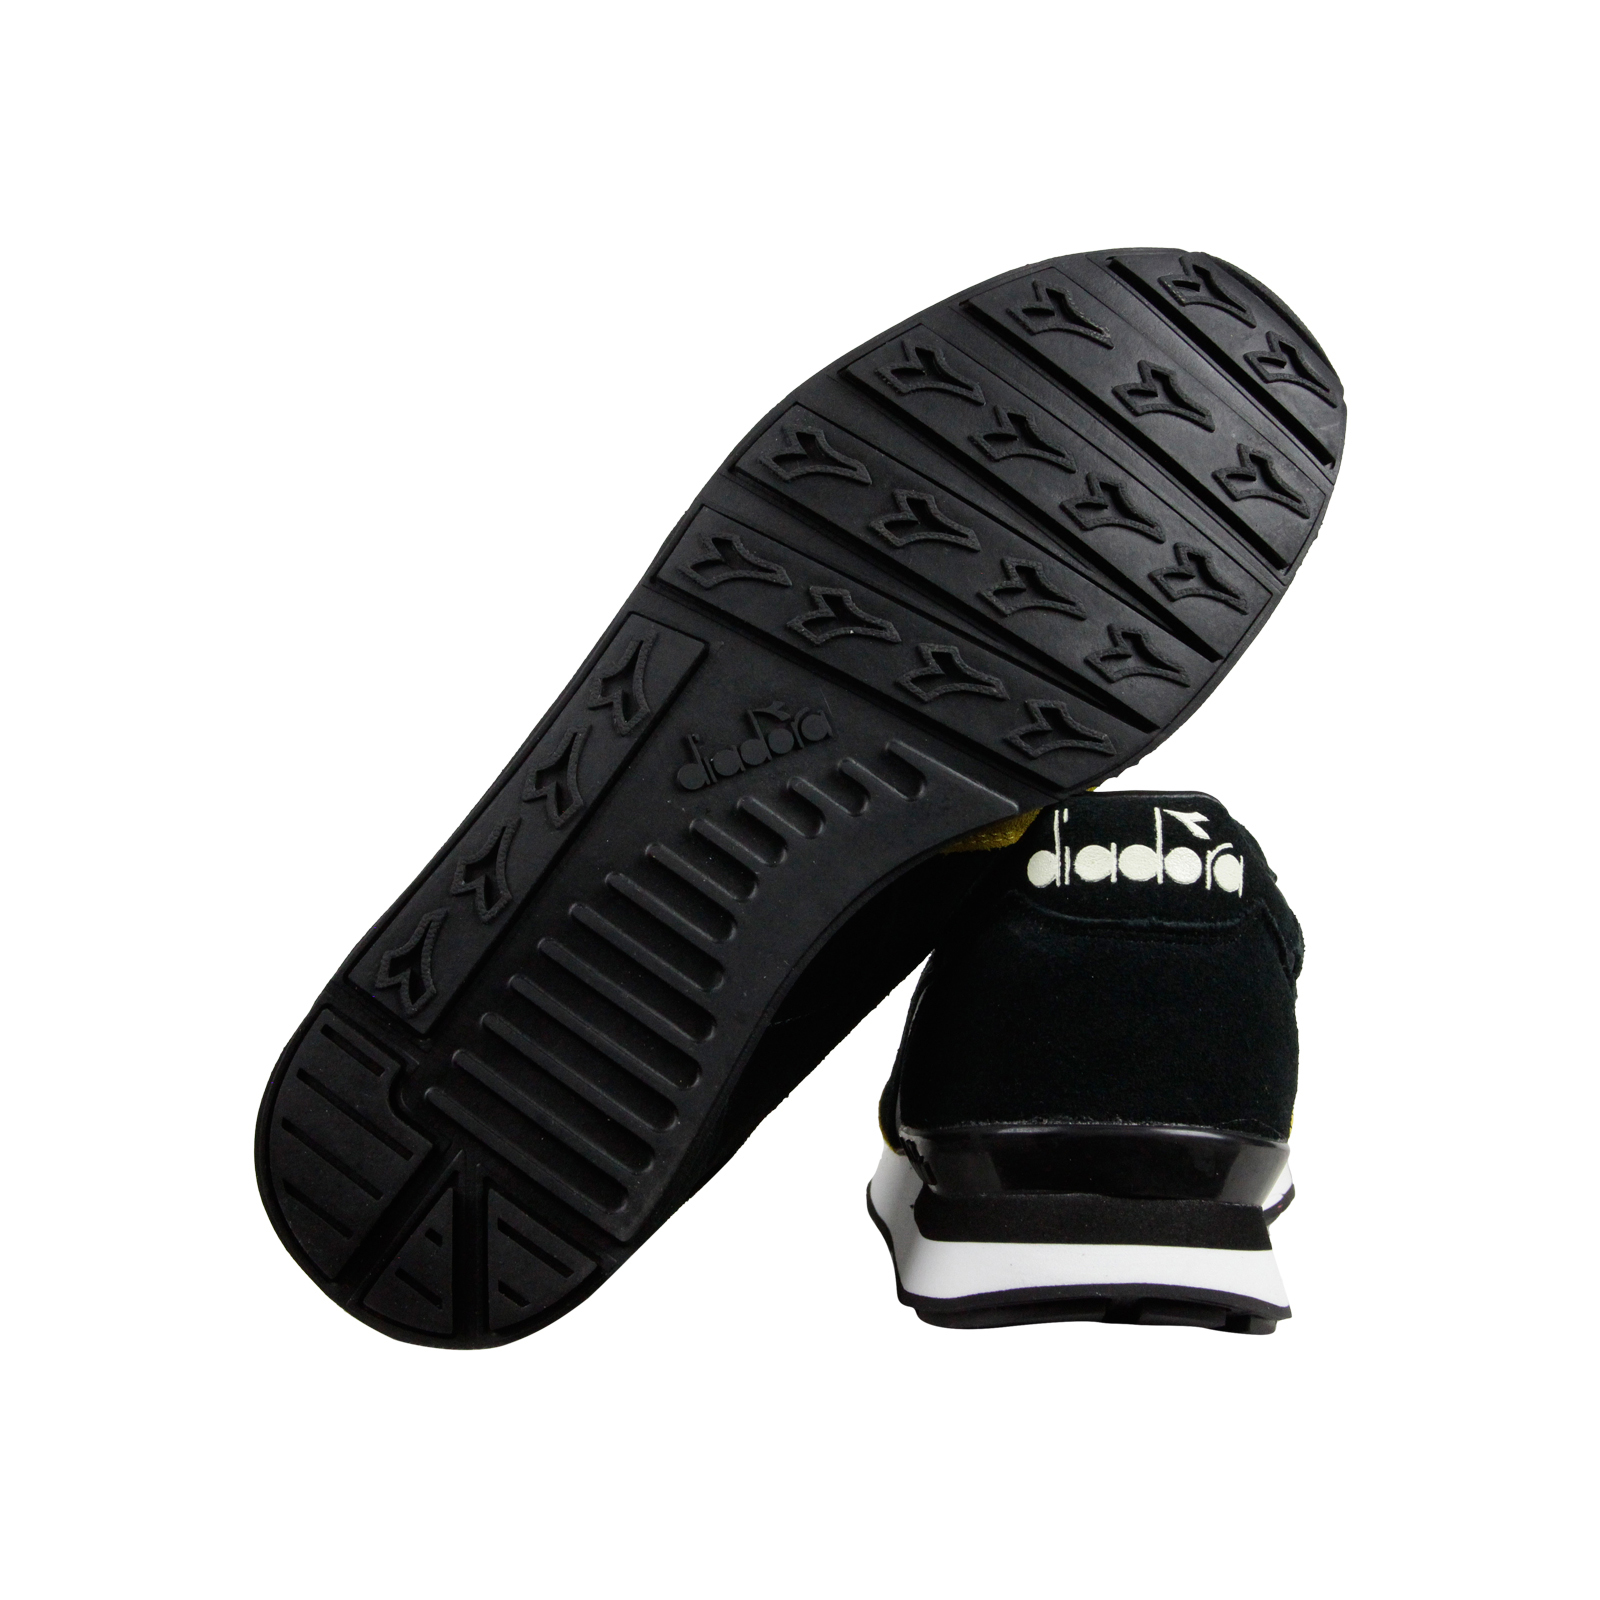 Diadora  CAMARO DOUBLE Economical, stylish, and eye-catching shoes